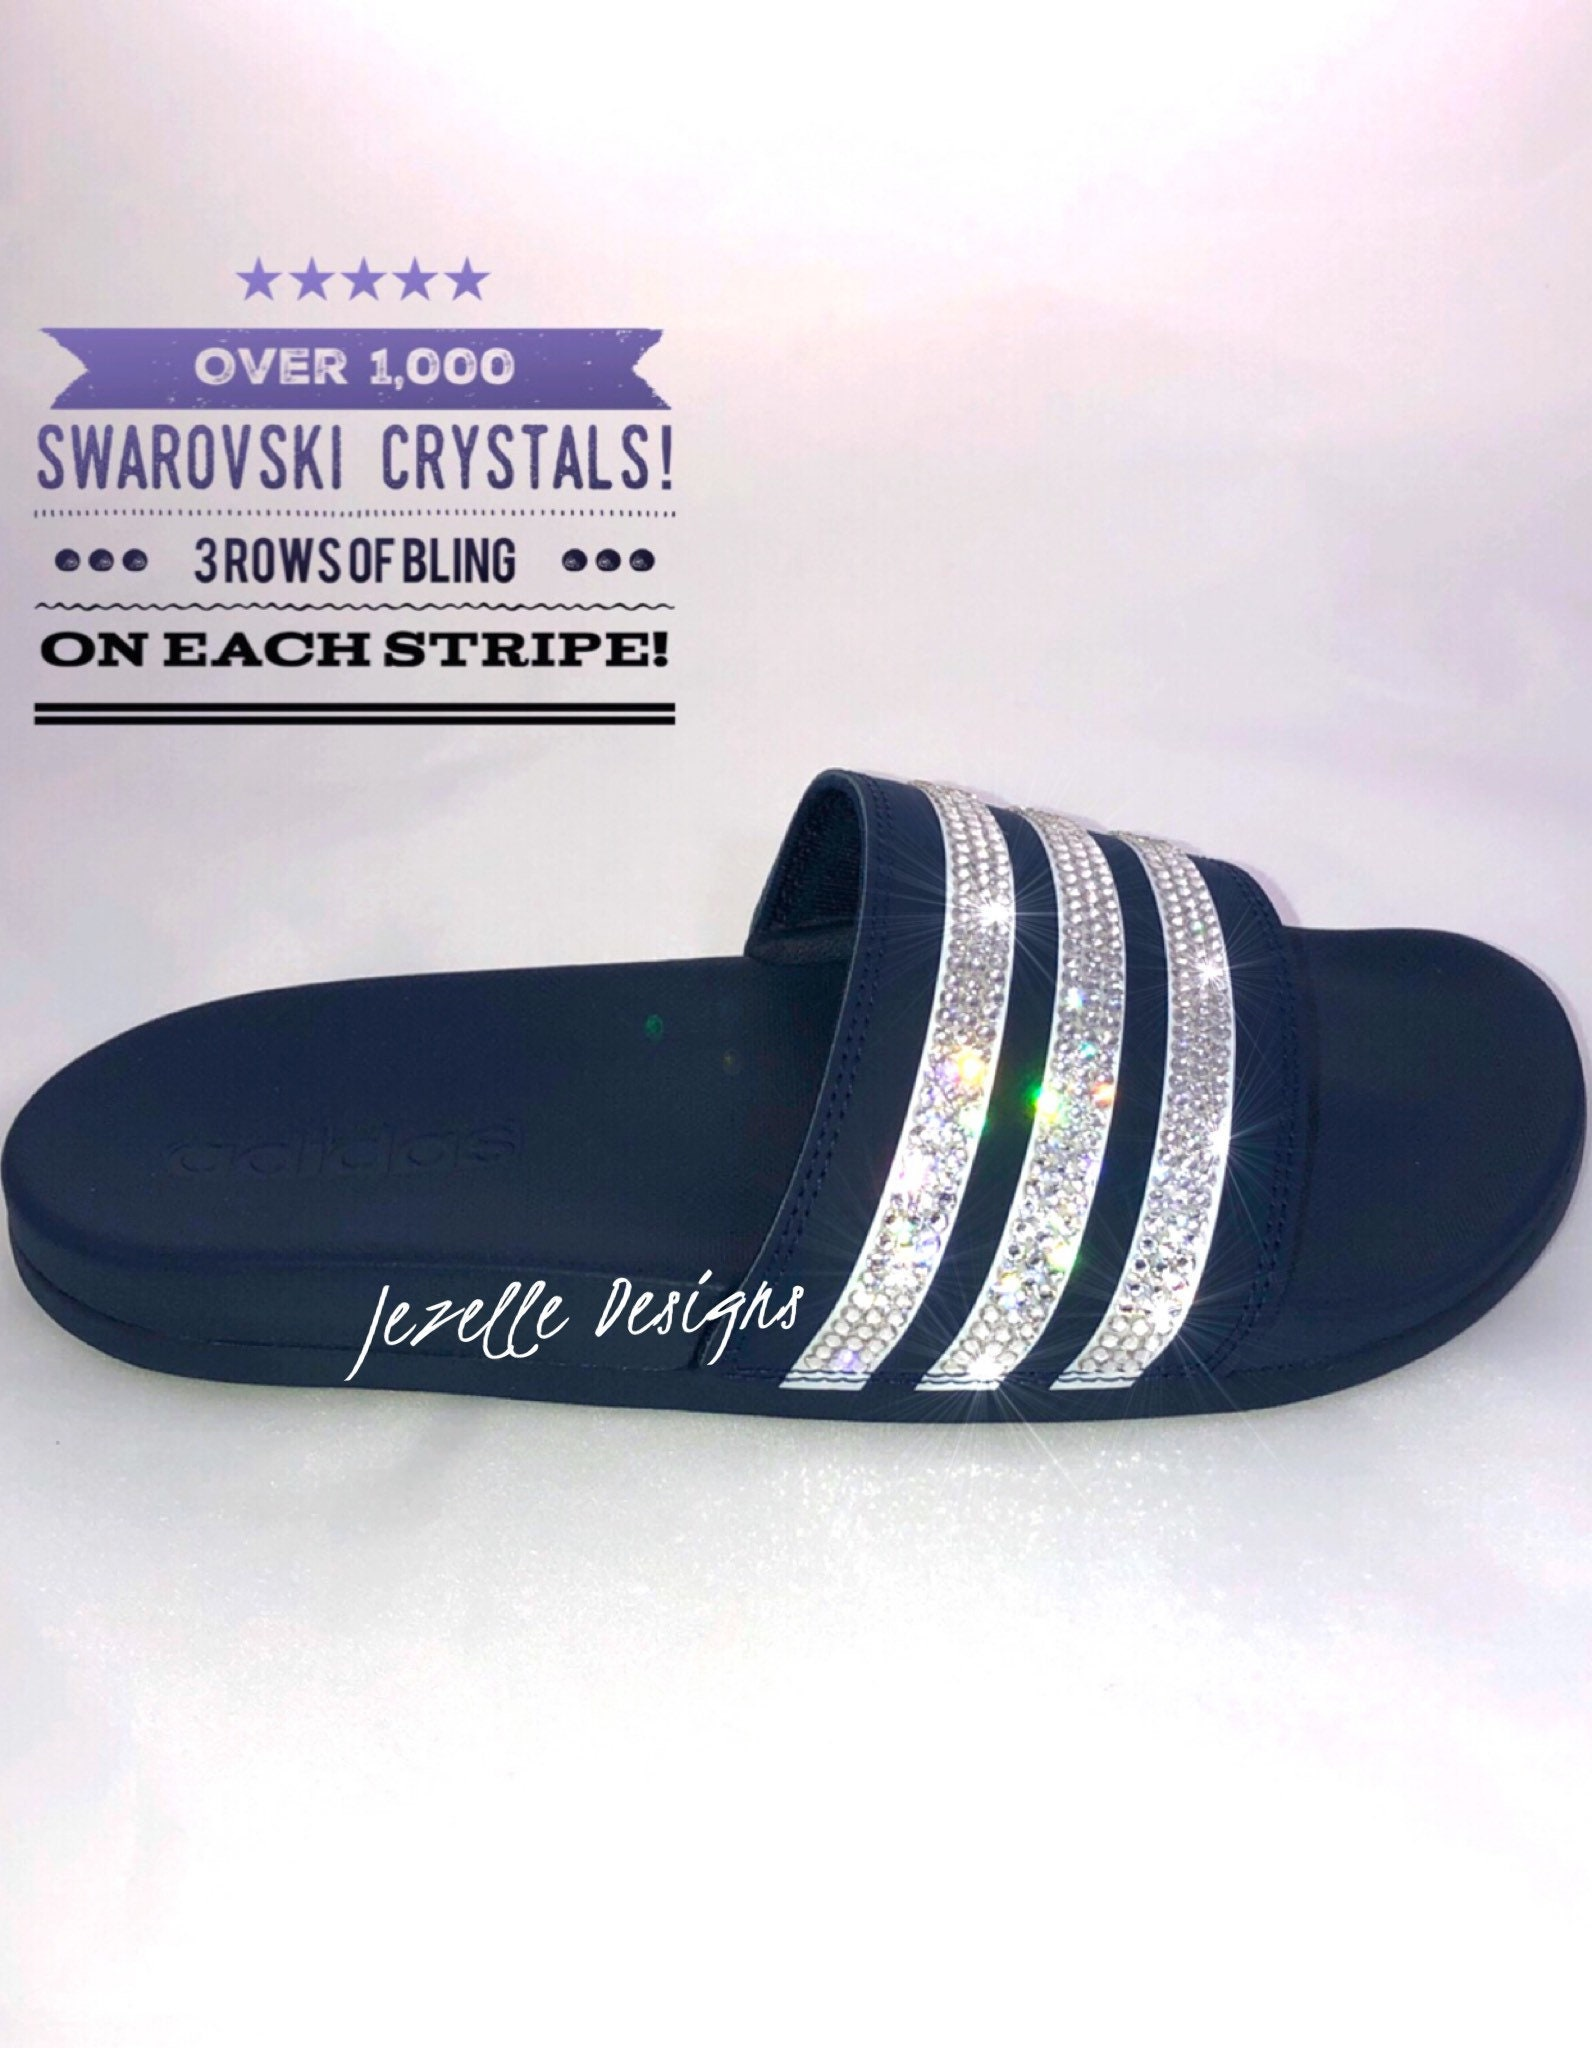 1580f78c4d027 FREE SHIPPING! Bling Adidas Slide Sandals - Super Cushy! Amazingly  Comfortable Sandals! Women's Custom Hand Jeweled w/Swarovski Crystals